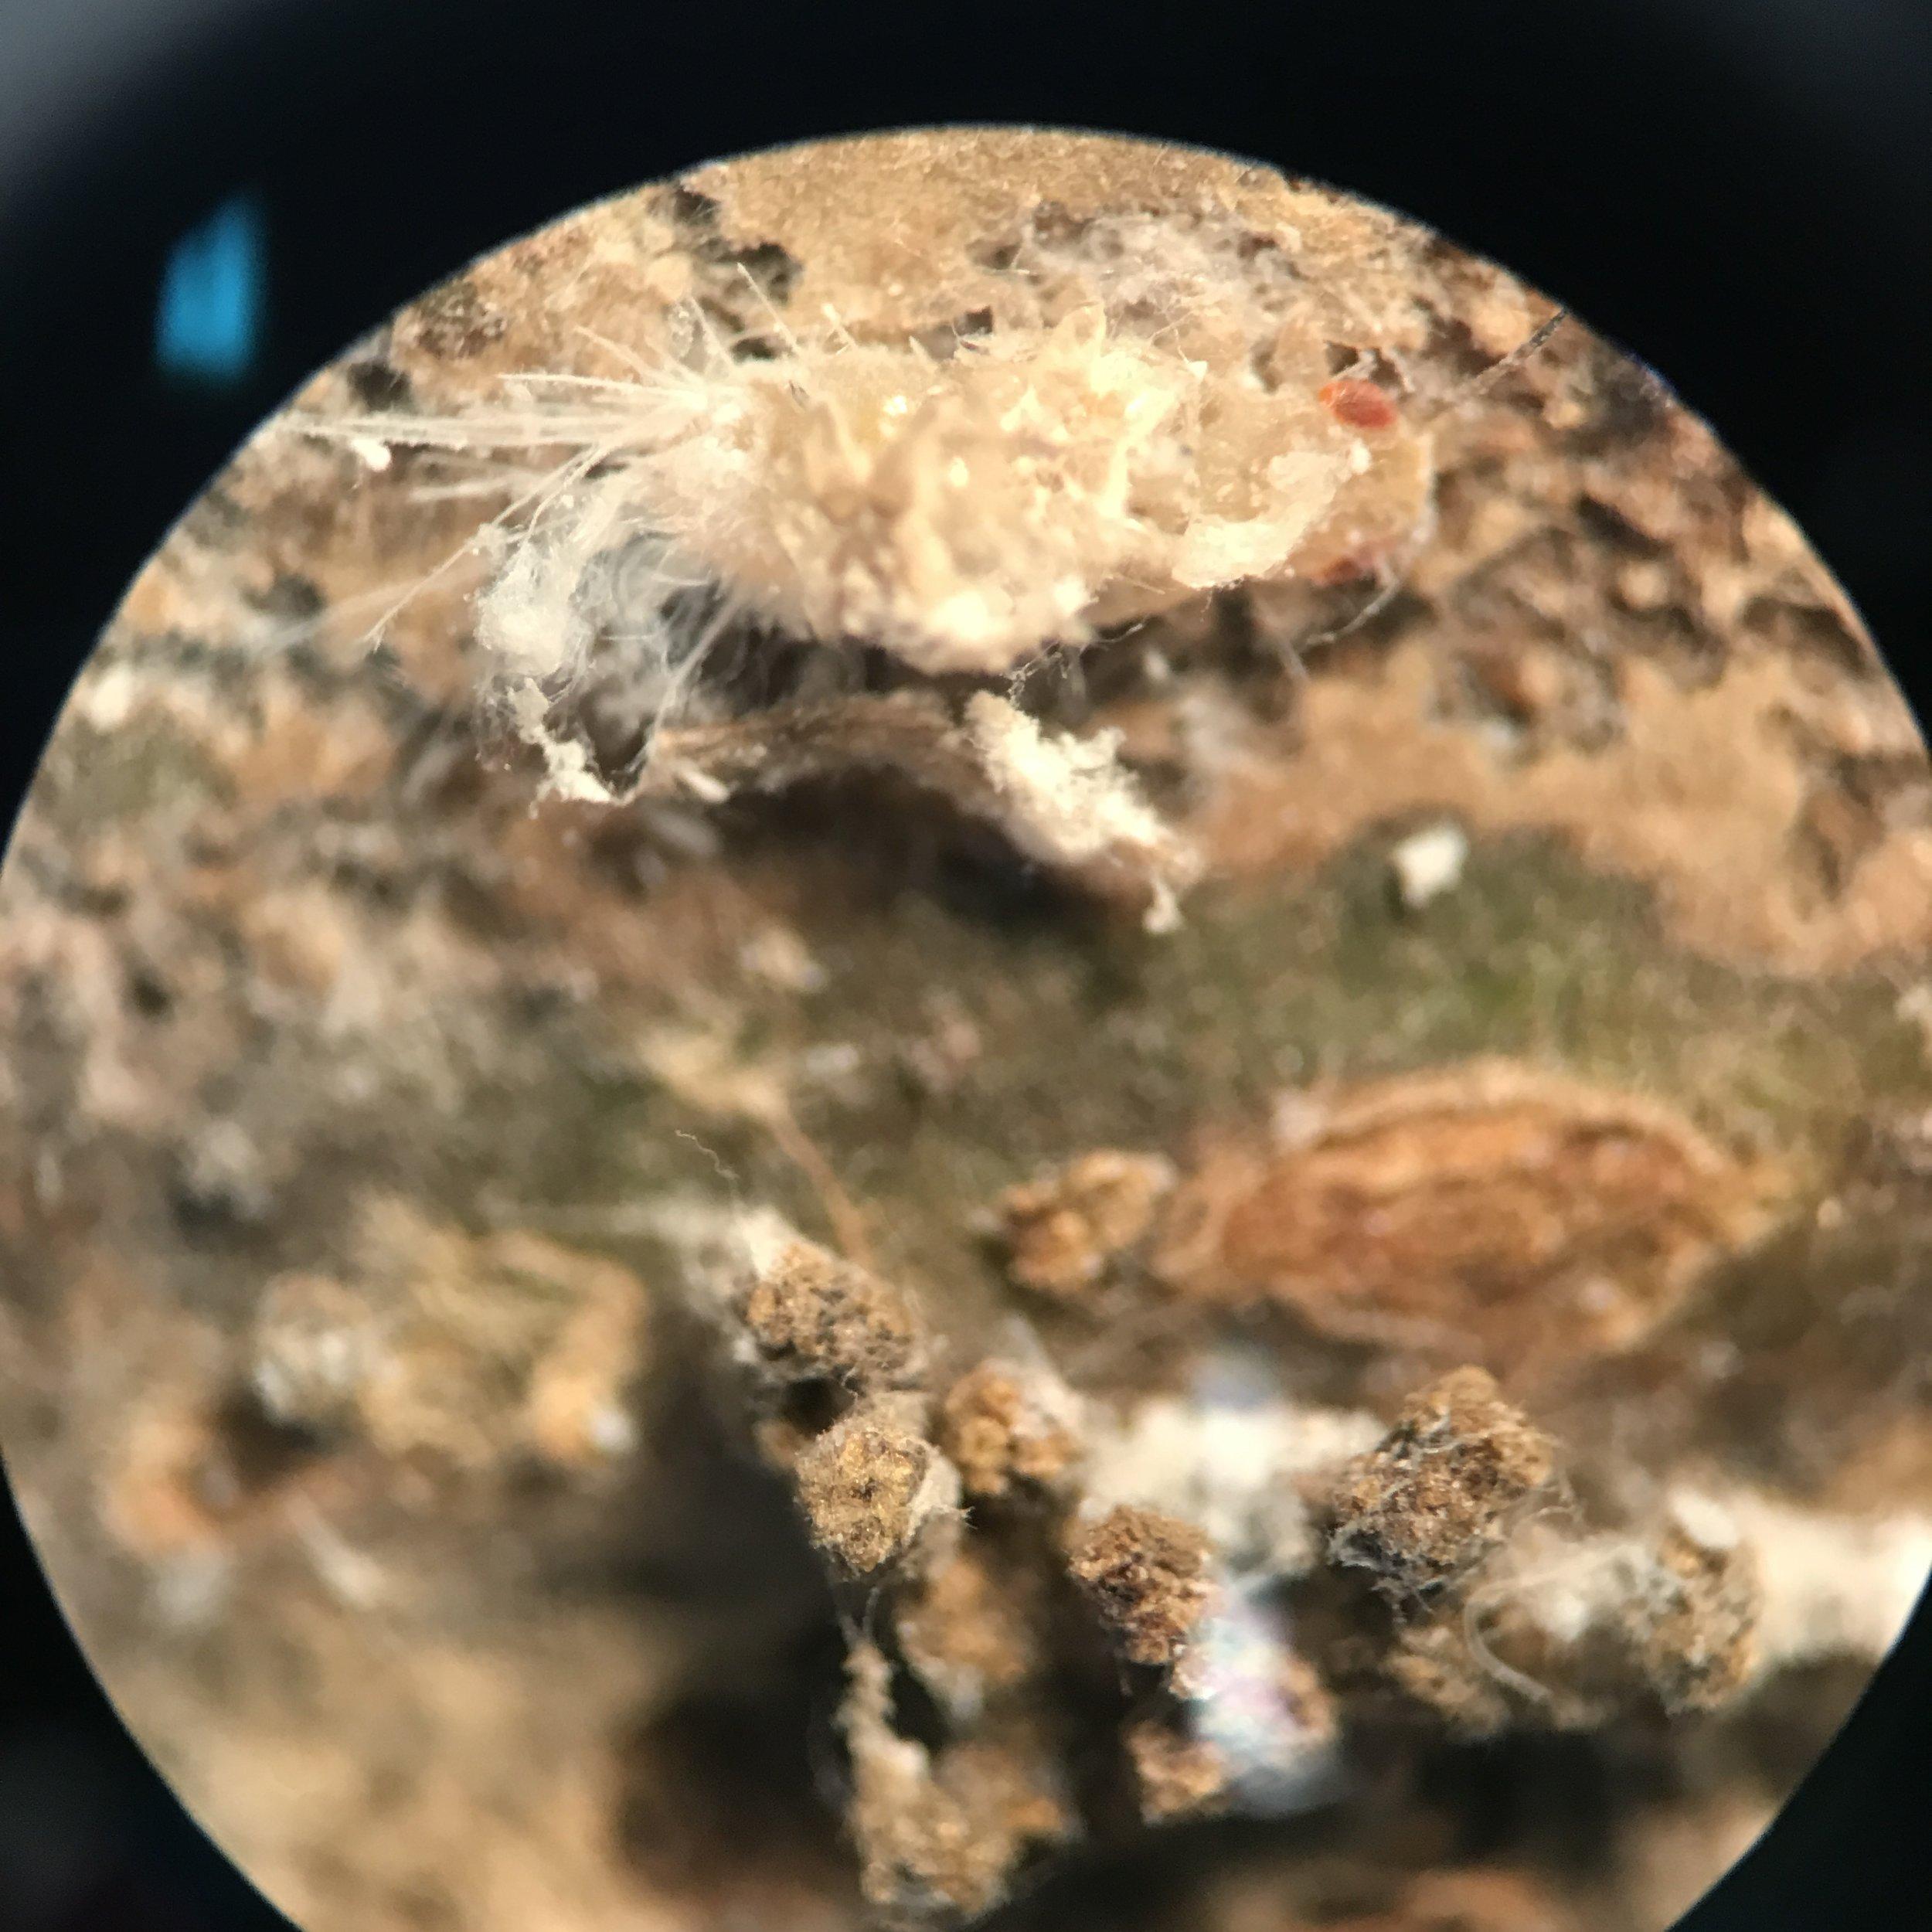 Microscope image of pest infestation.